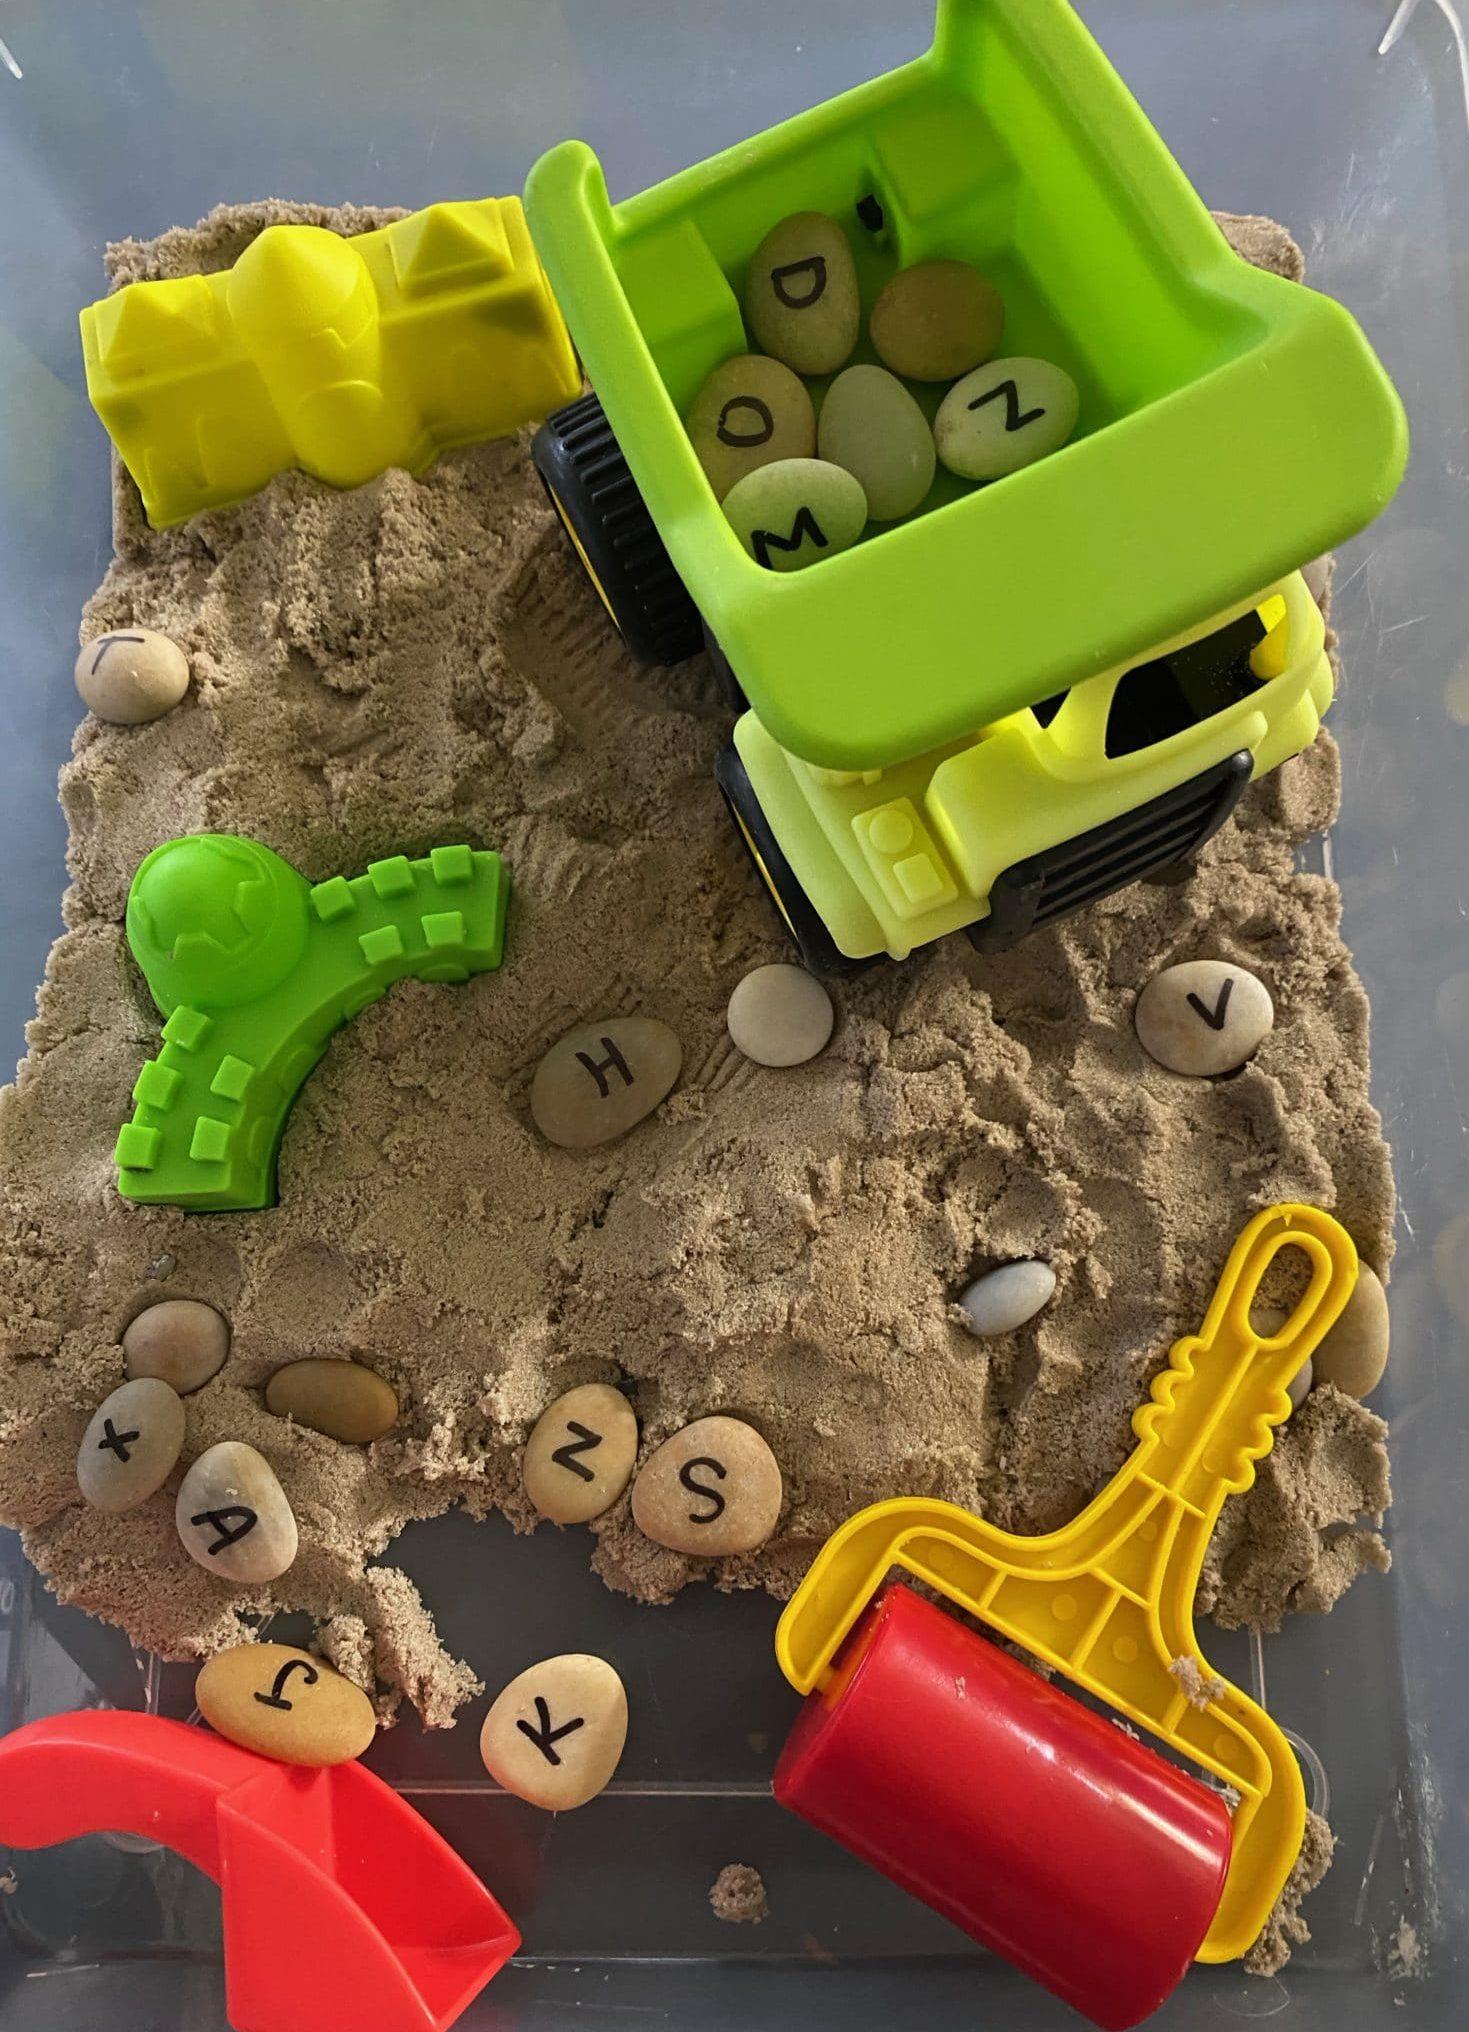 Magnetic Letters Children Alphabet Magnets In Upper Learning Kids Toys Case  Hot